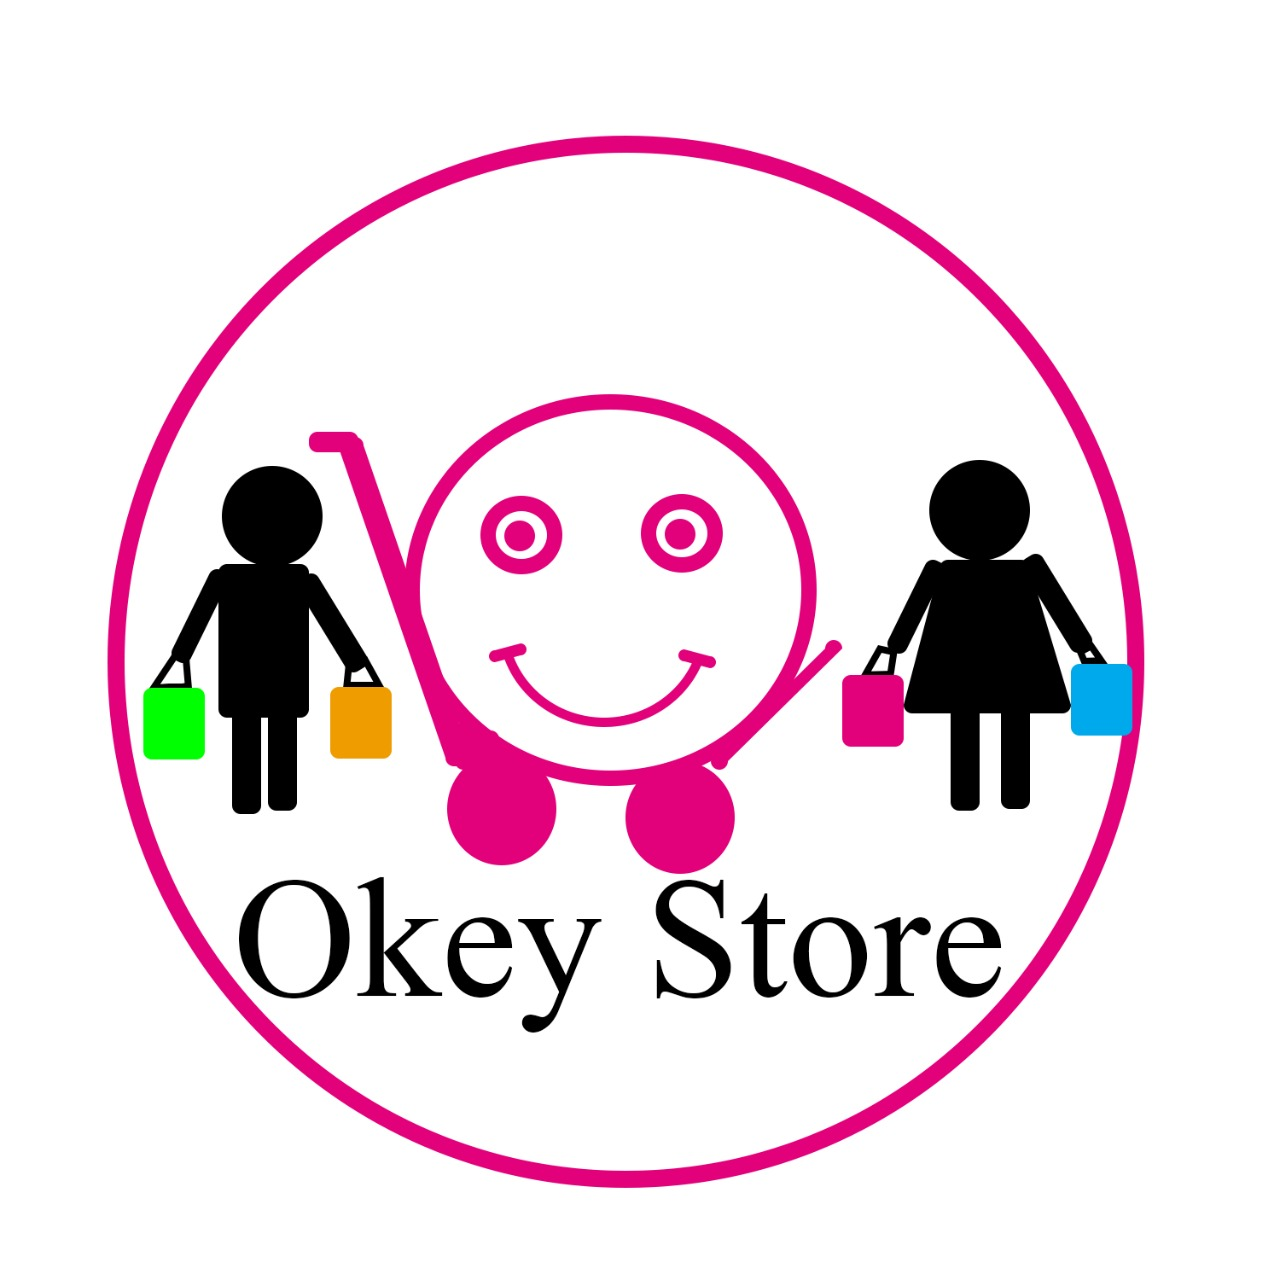 okey store